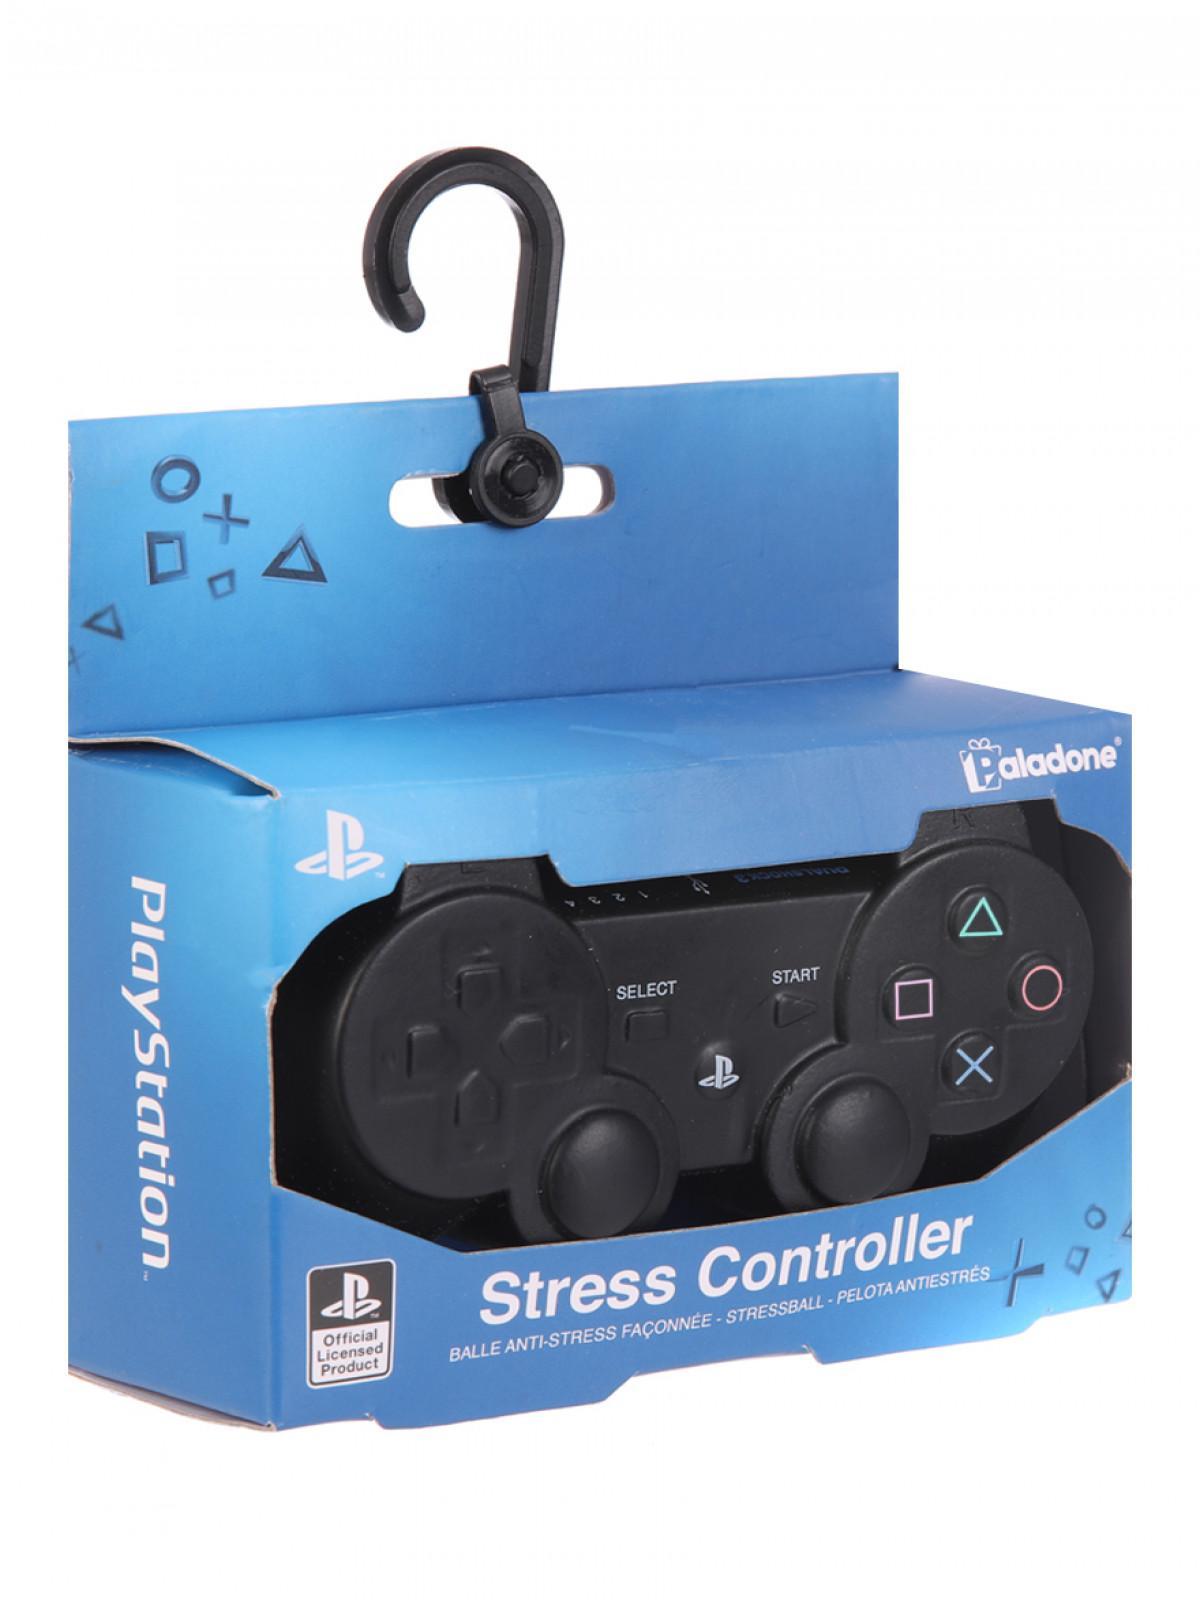 Playstation Stress Controller £4.80 @ Peacocks (£2.99 C&C / £3.99 P&P)